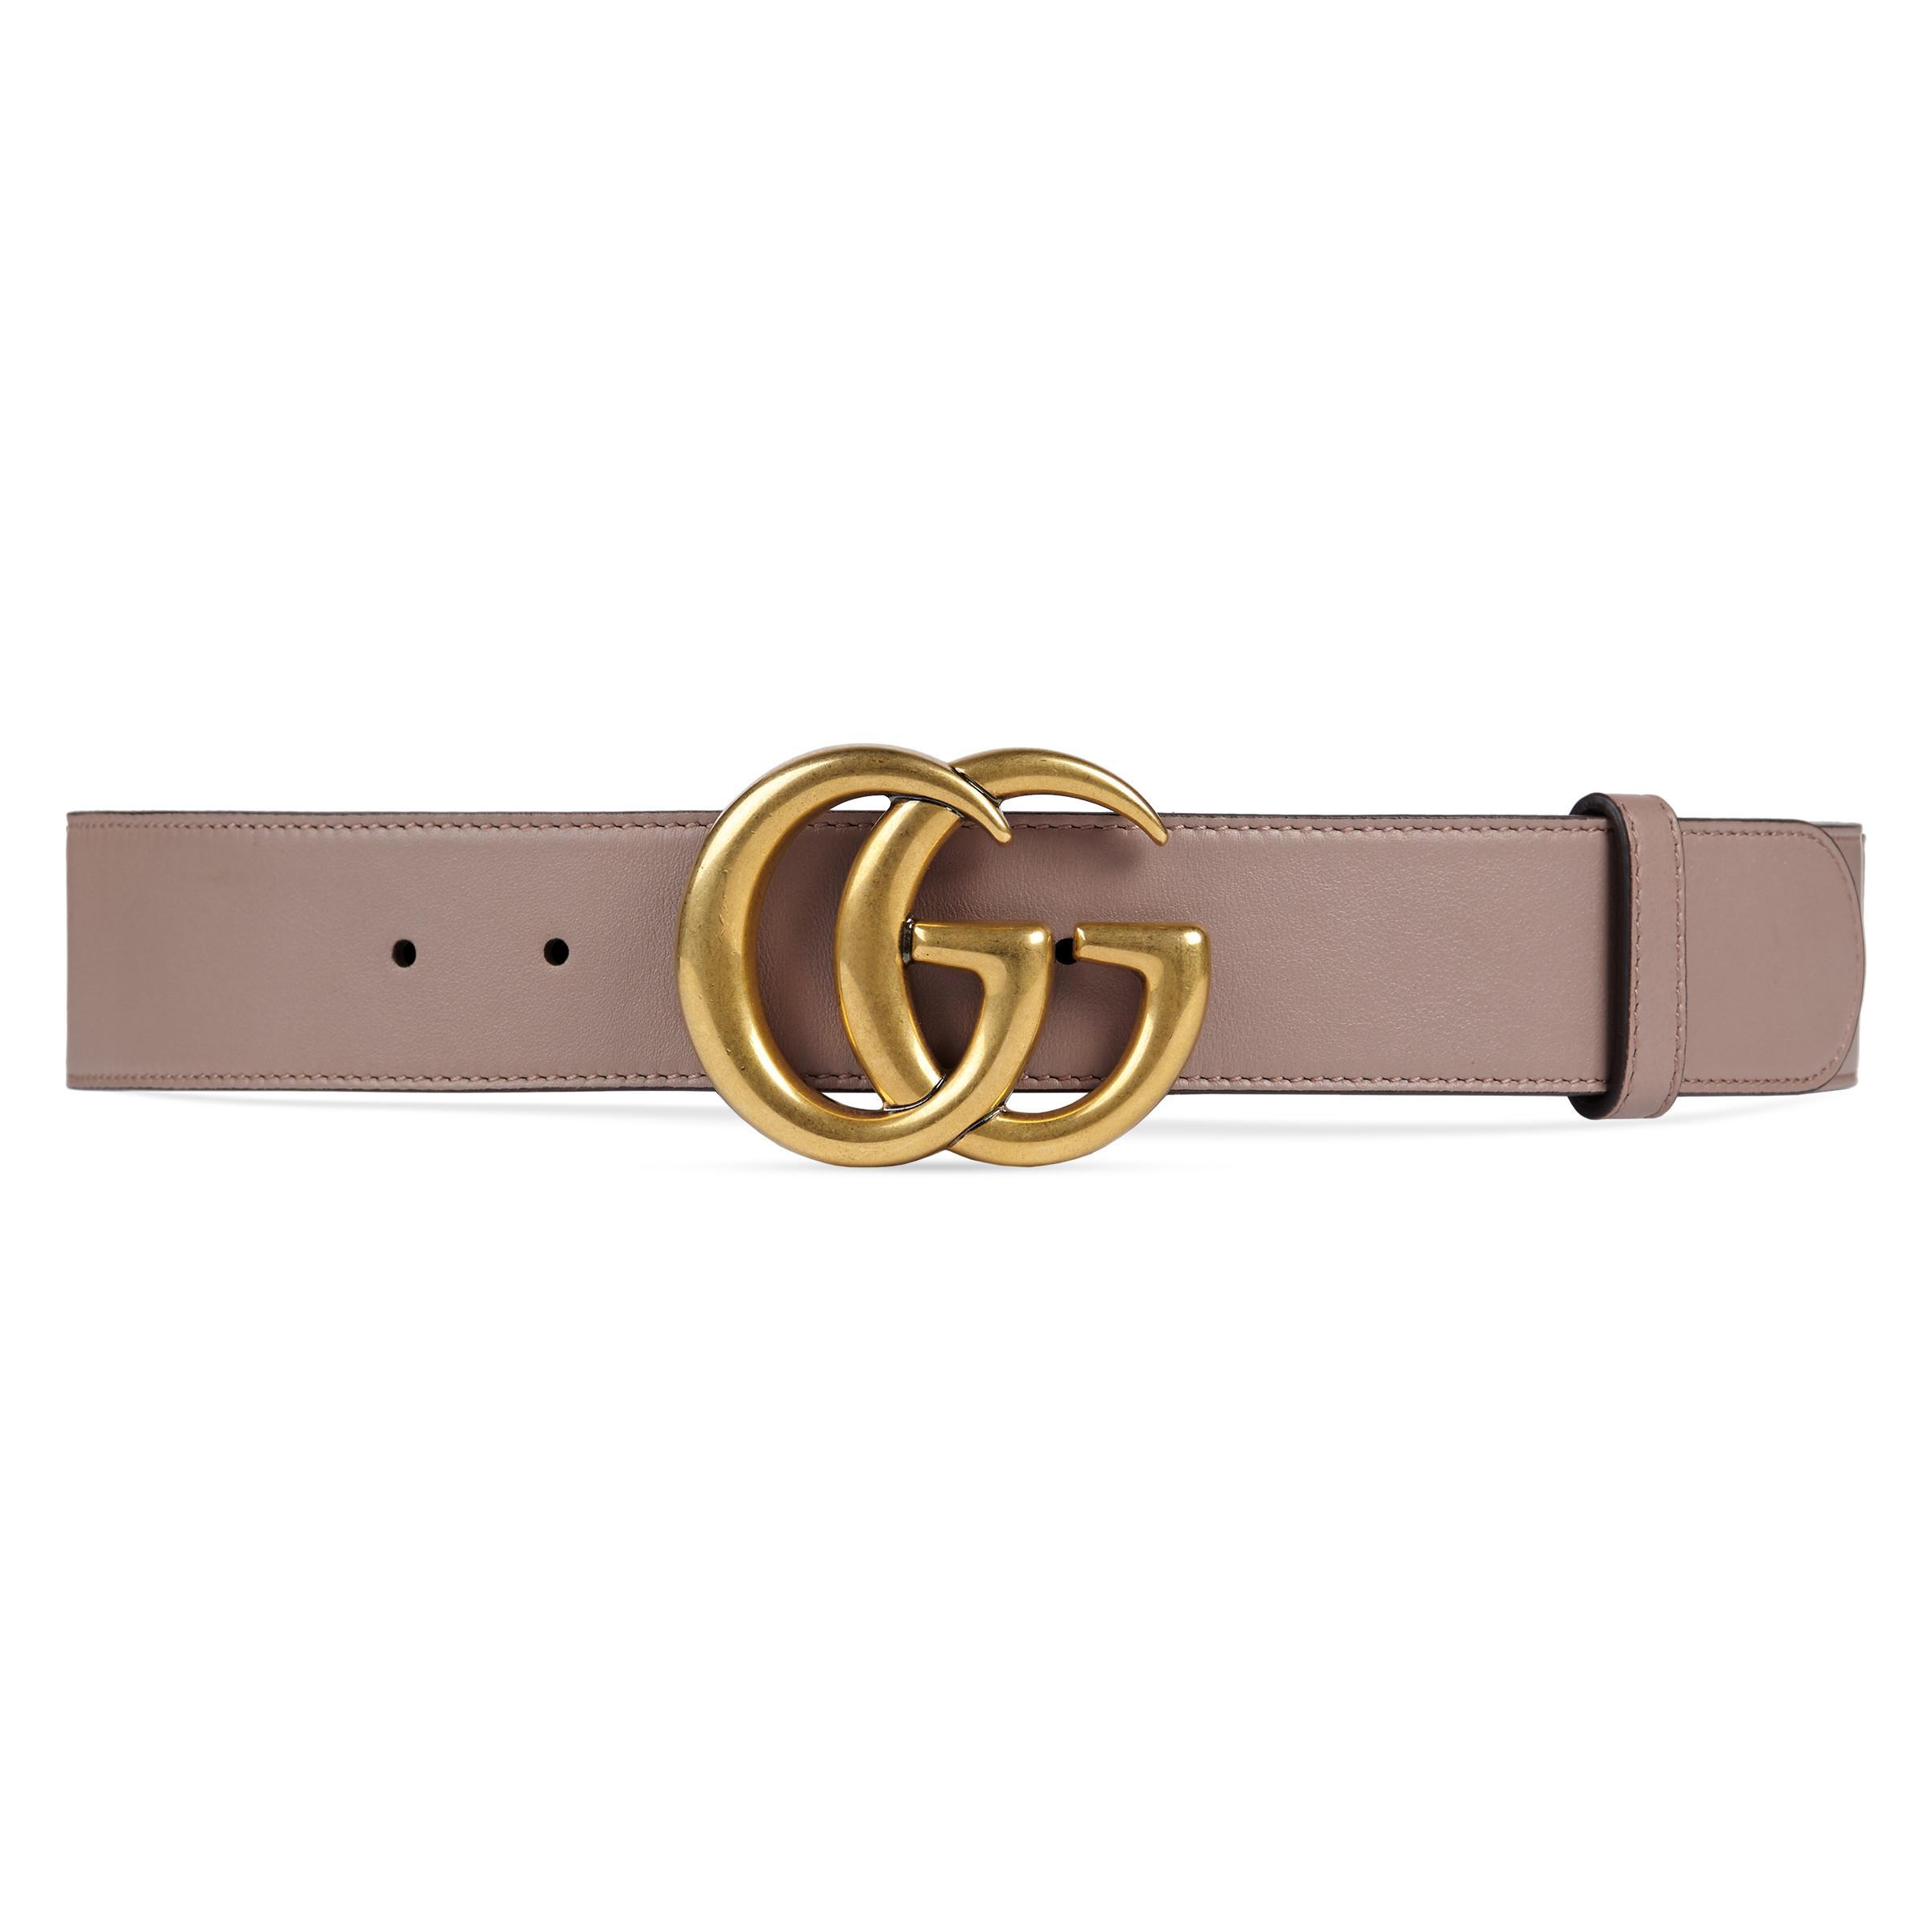 a50869da6 Gucci - Natural Cinturón de Piel con Hebilla de Doble G - Lyst. Ver en  pantalla completa